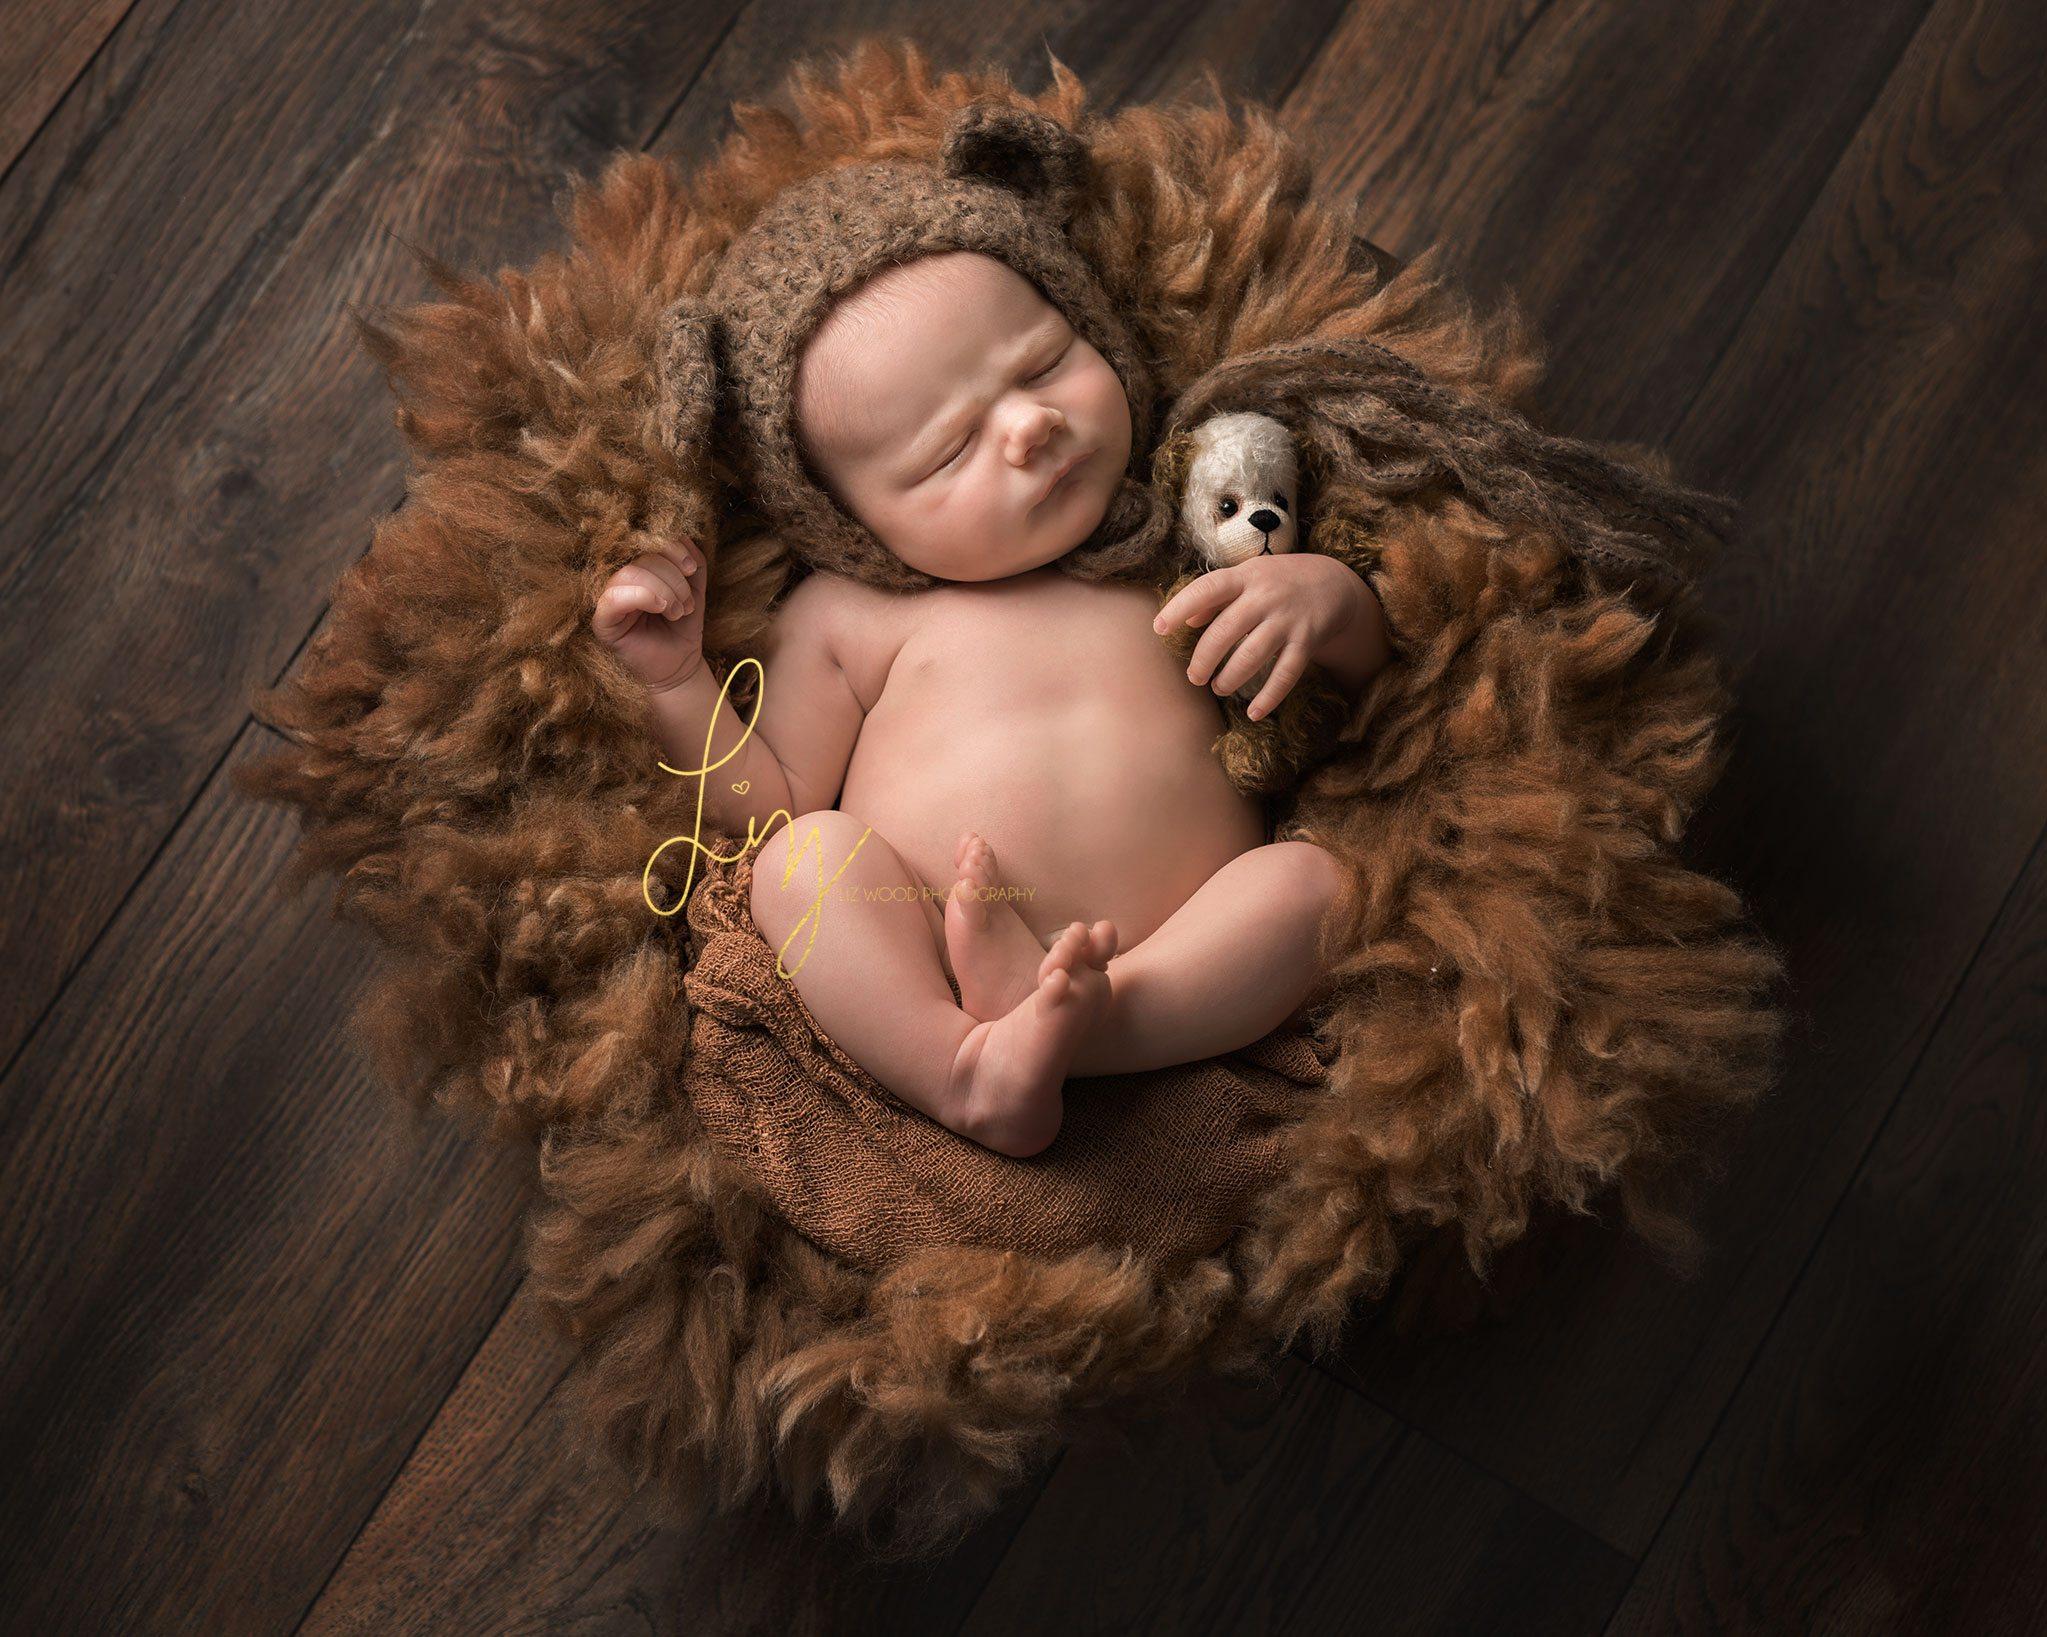 Essex baby photographer, bear ear hat on a cute sleeping newborn baby boy, laying on an Alpaca fleece.